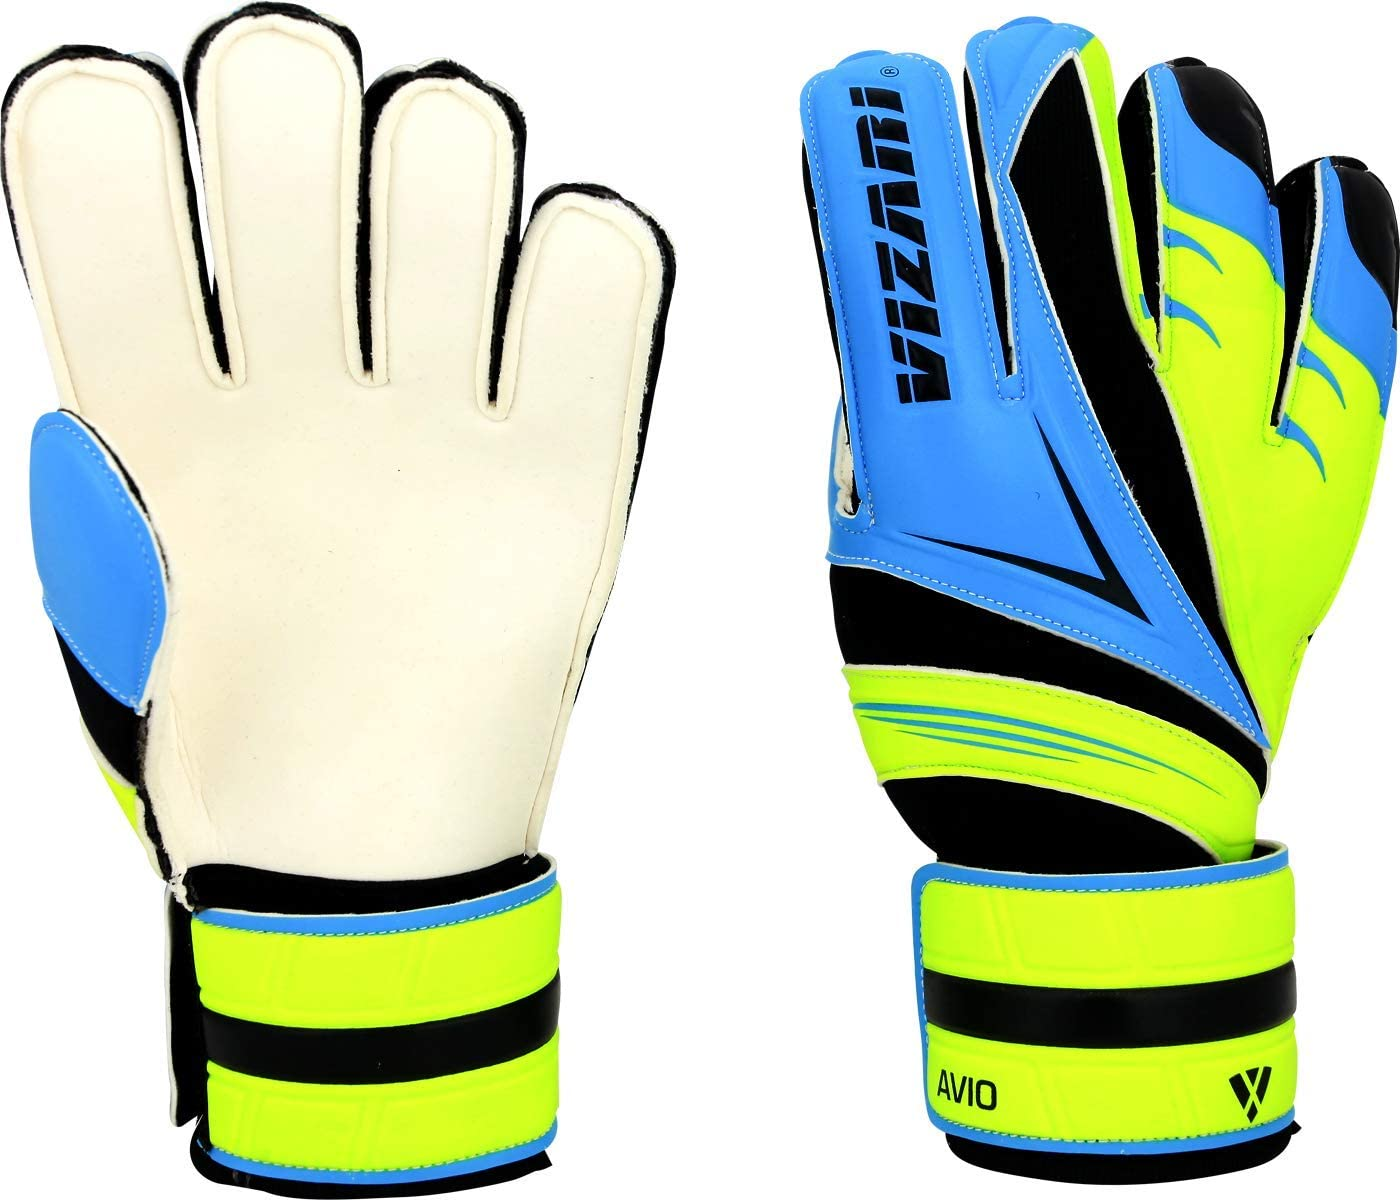 Vizari Avio F.R.F Glove : Sports & Outdoors